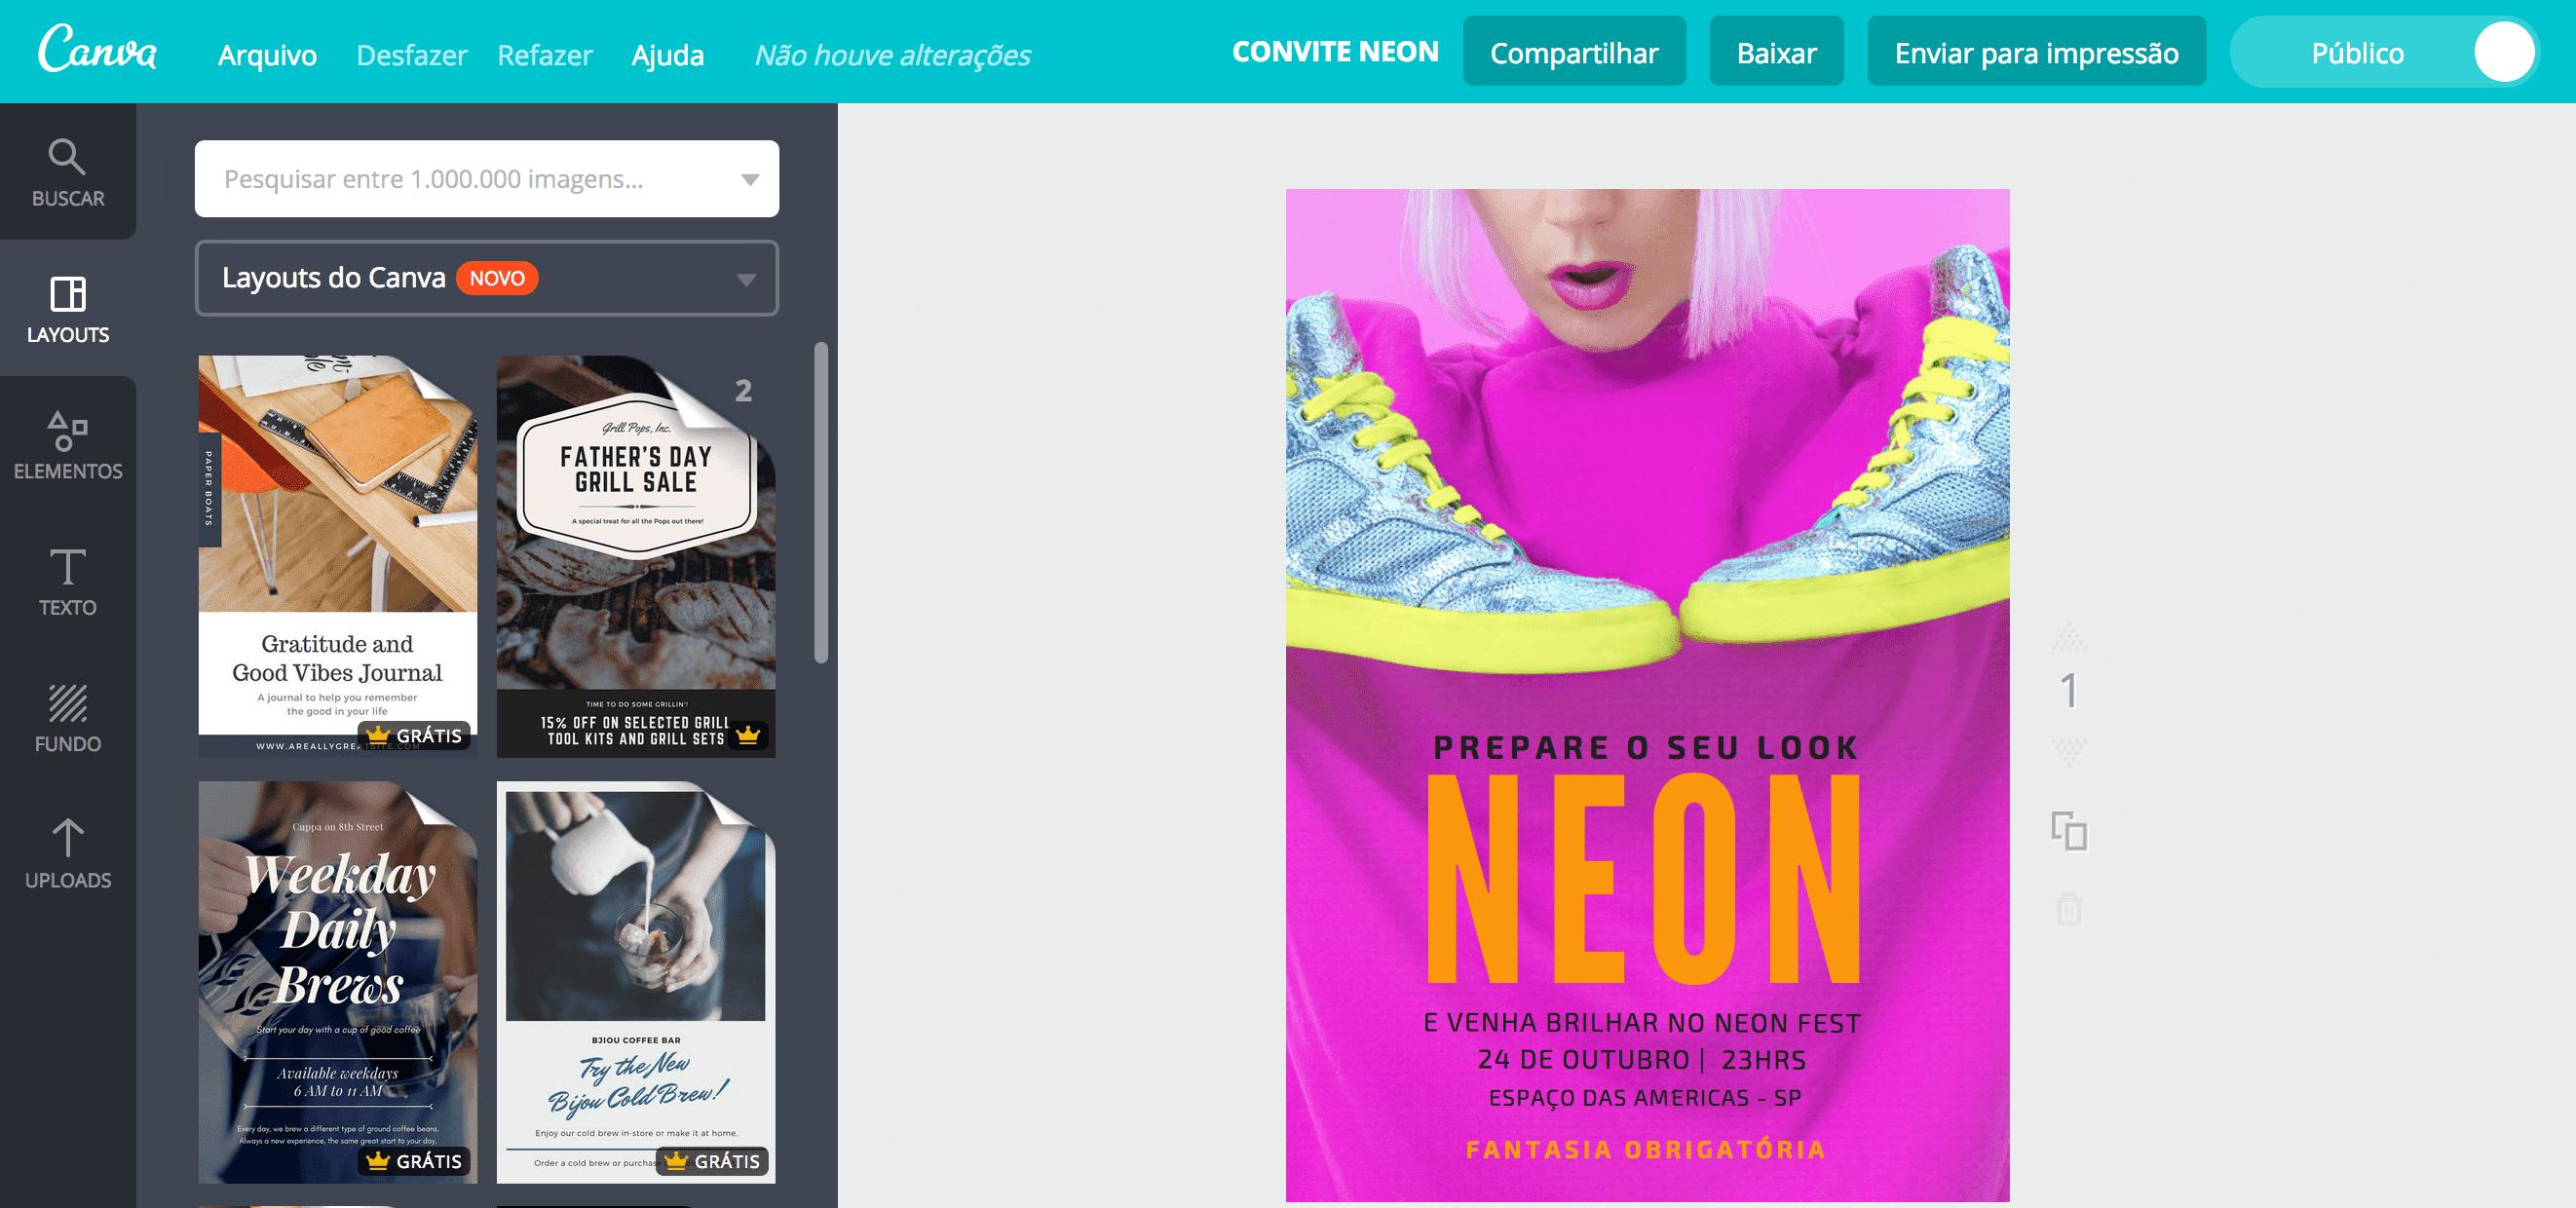 Convite para festa neon